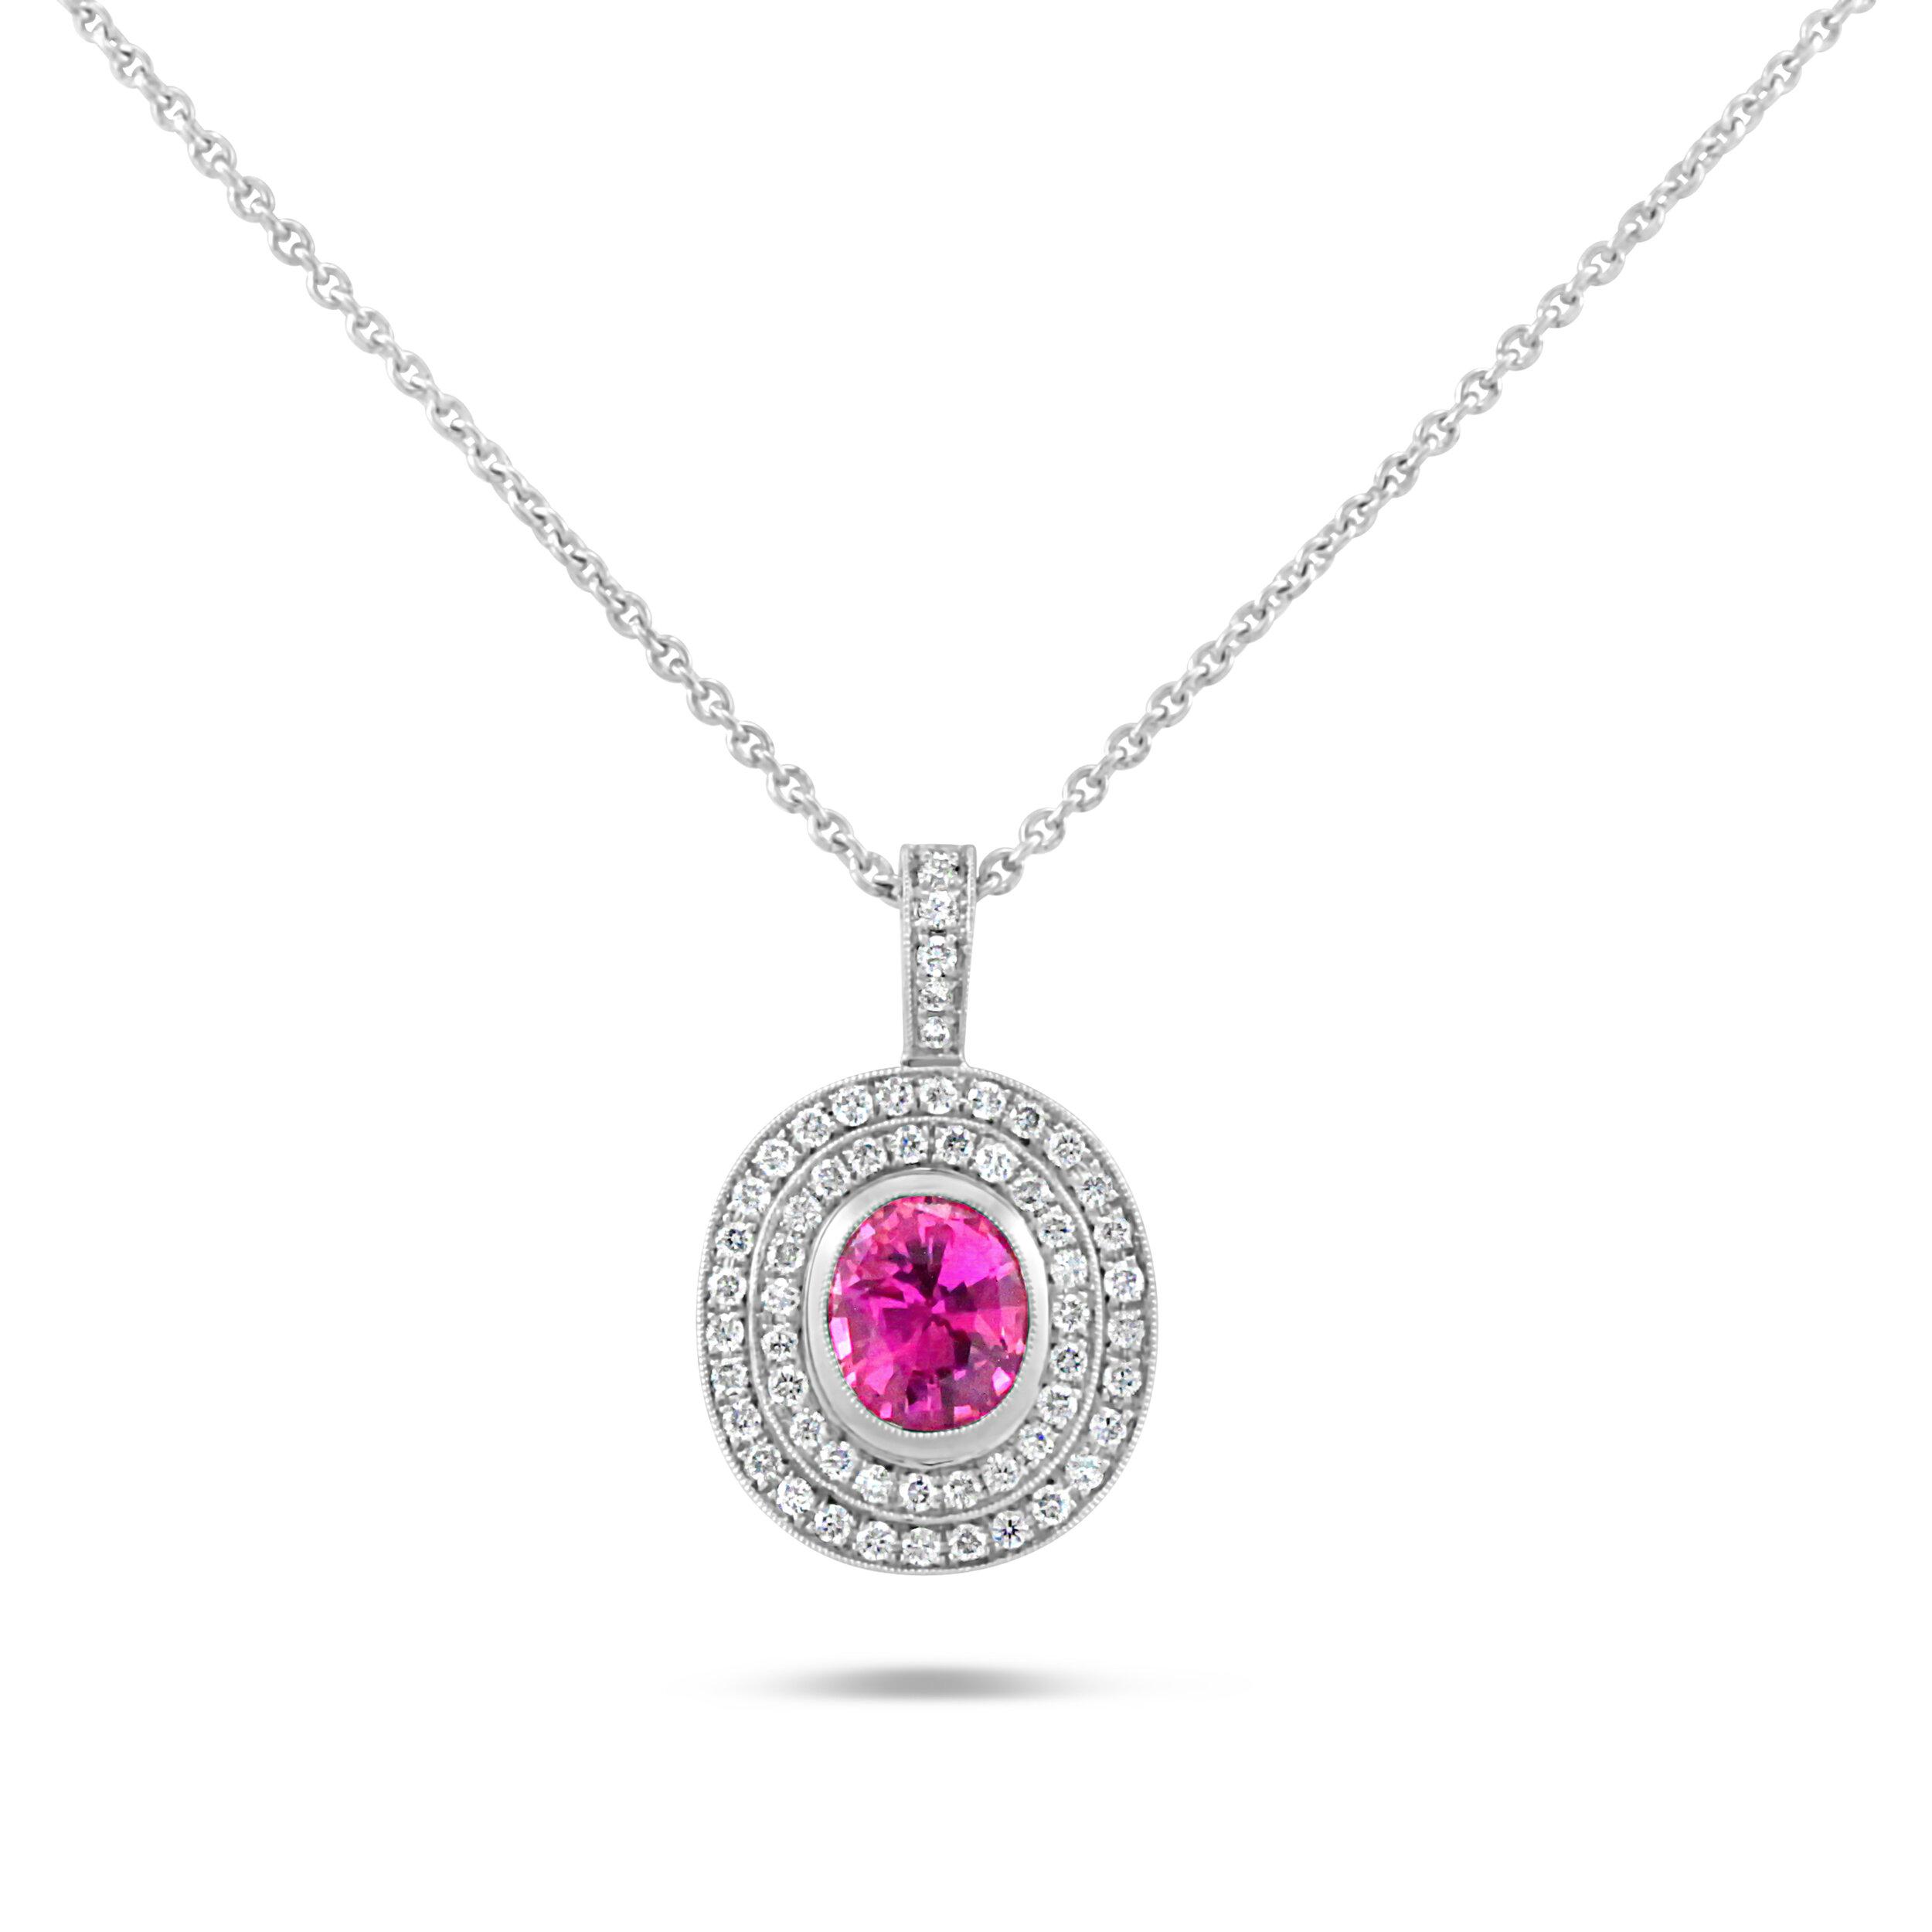 2 ct pink sapphire front.jpg